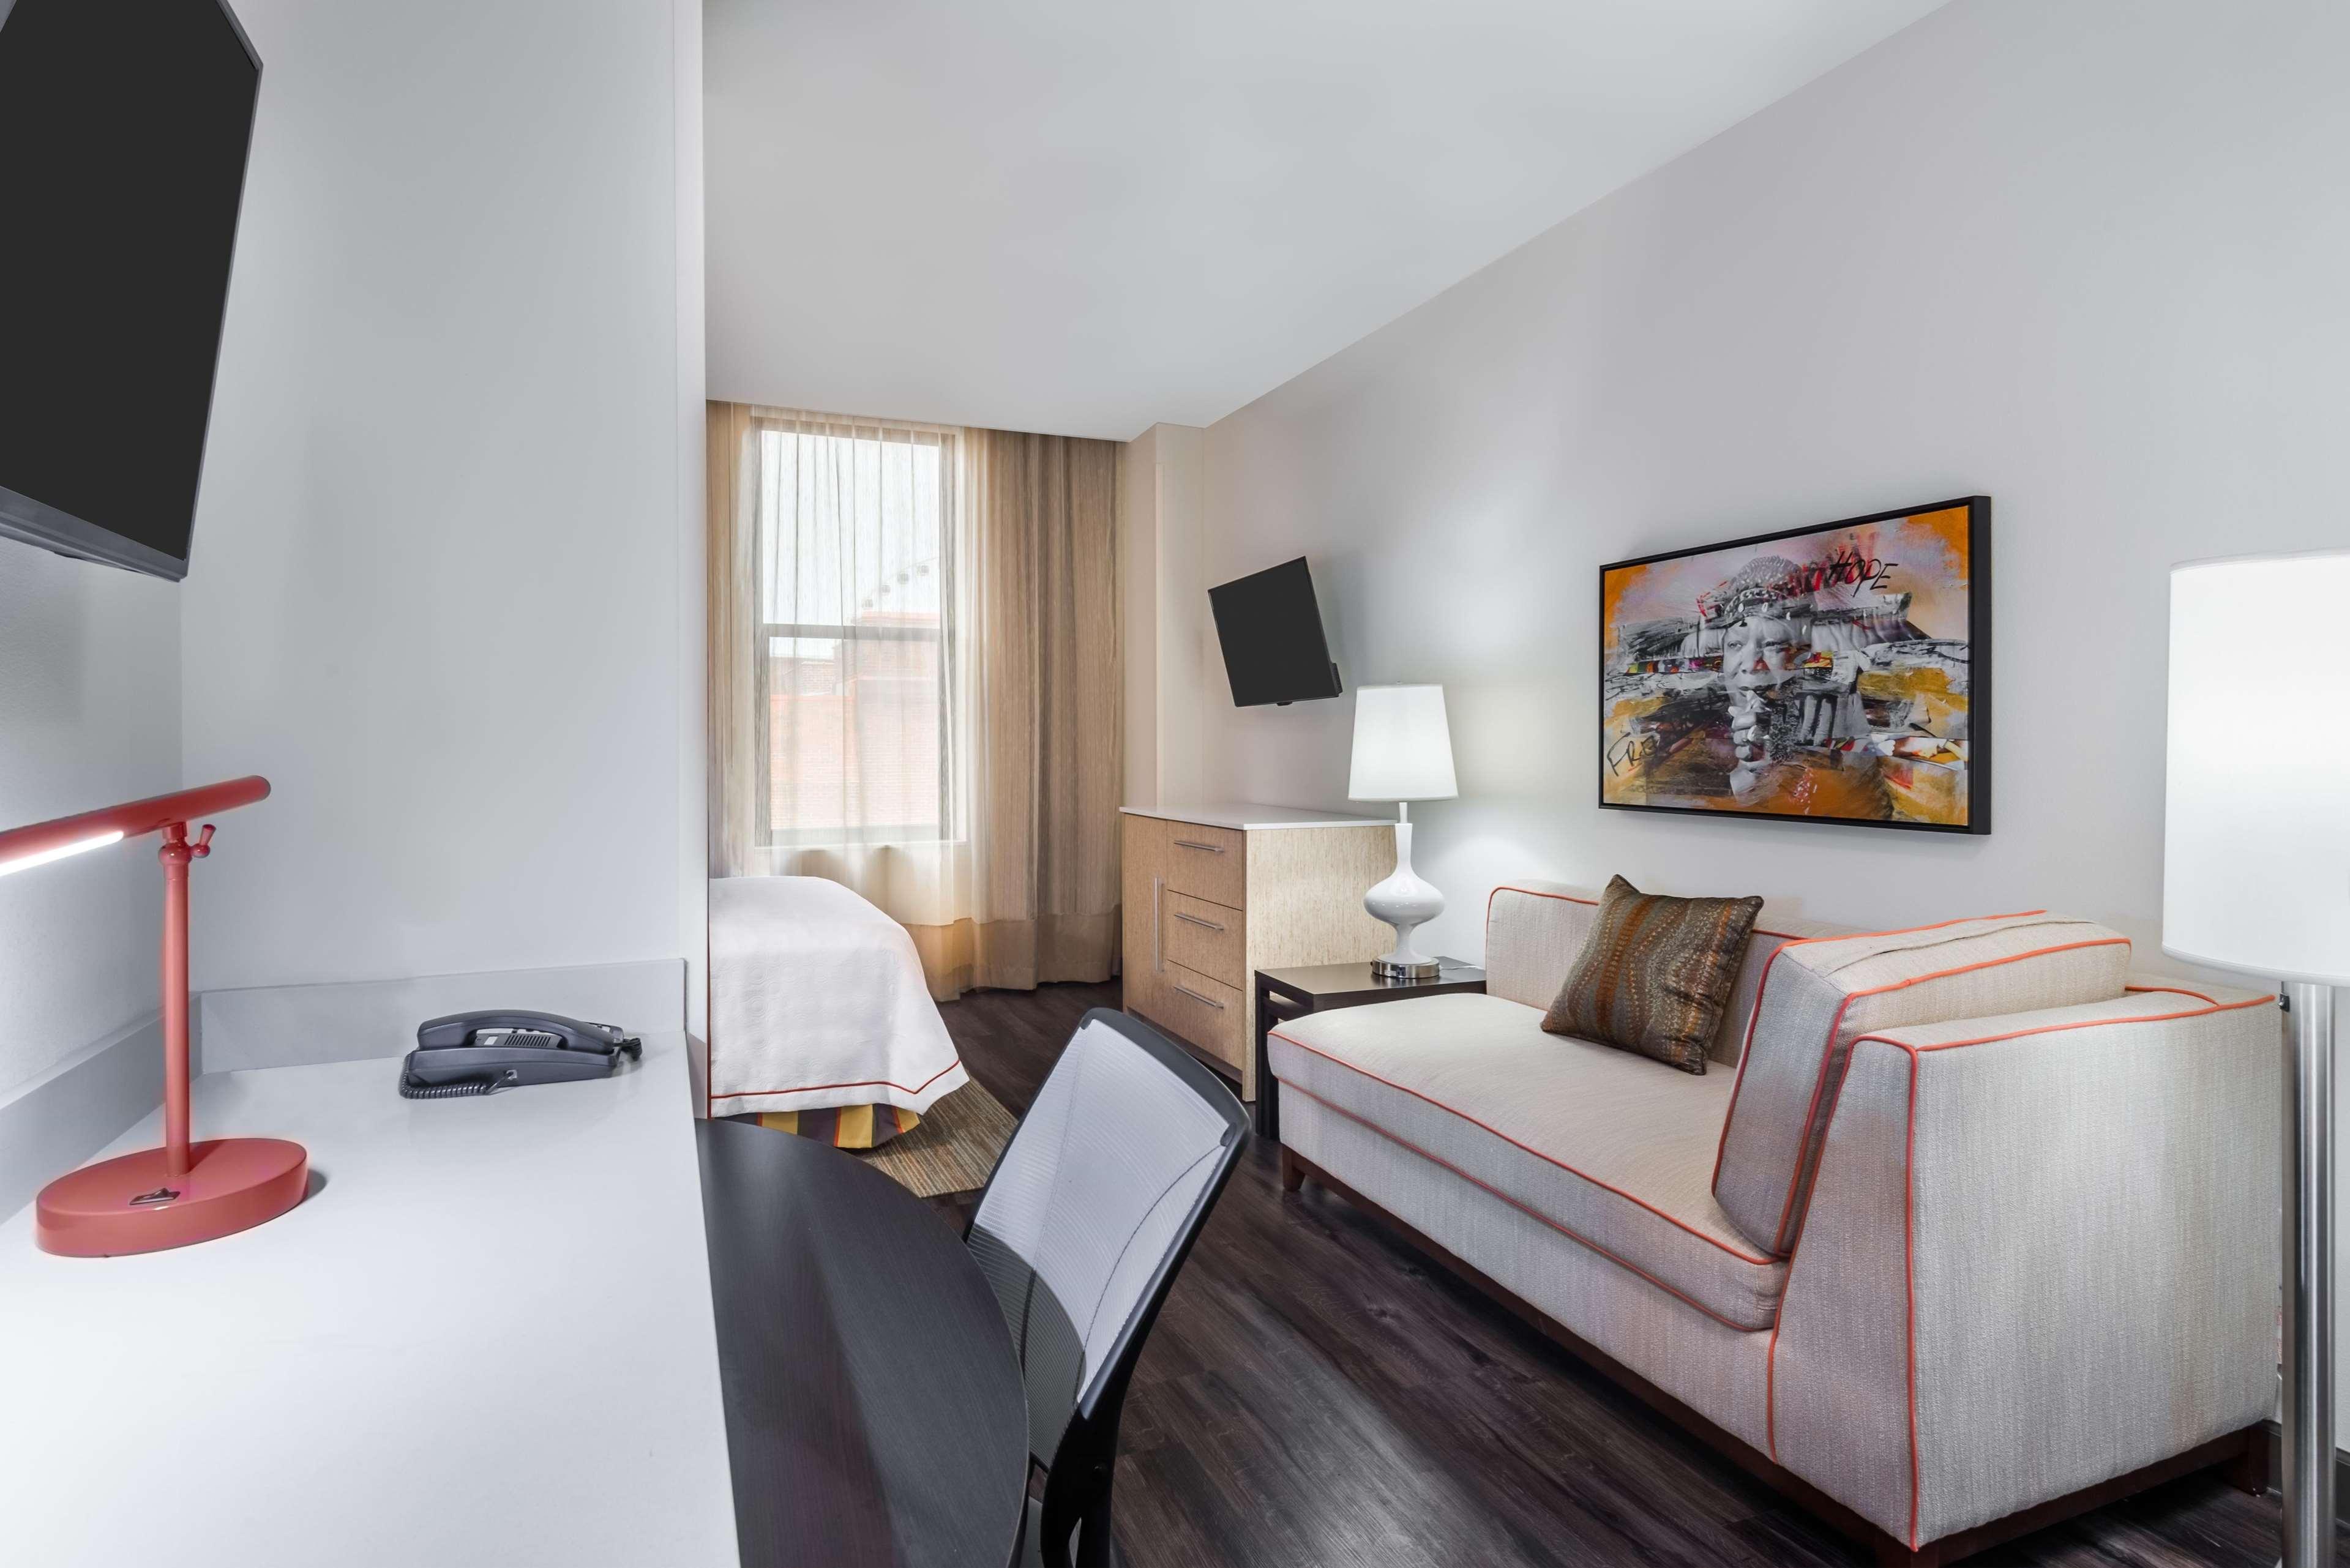 Home2 Suites by Hilton Atlanta Downtown image 1